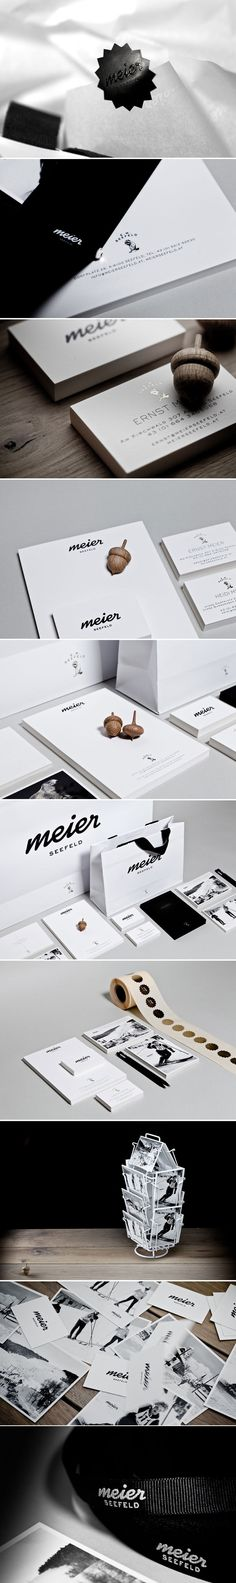 Meier Seefeld by Bureaura Bensteiner